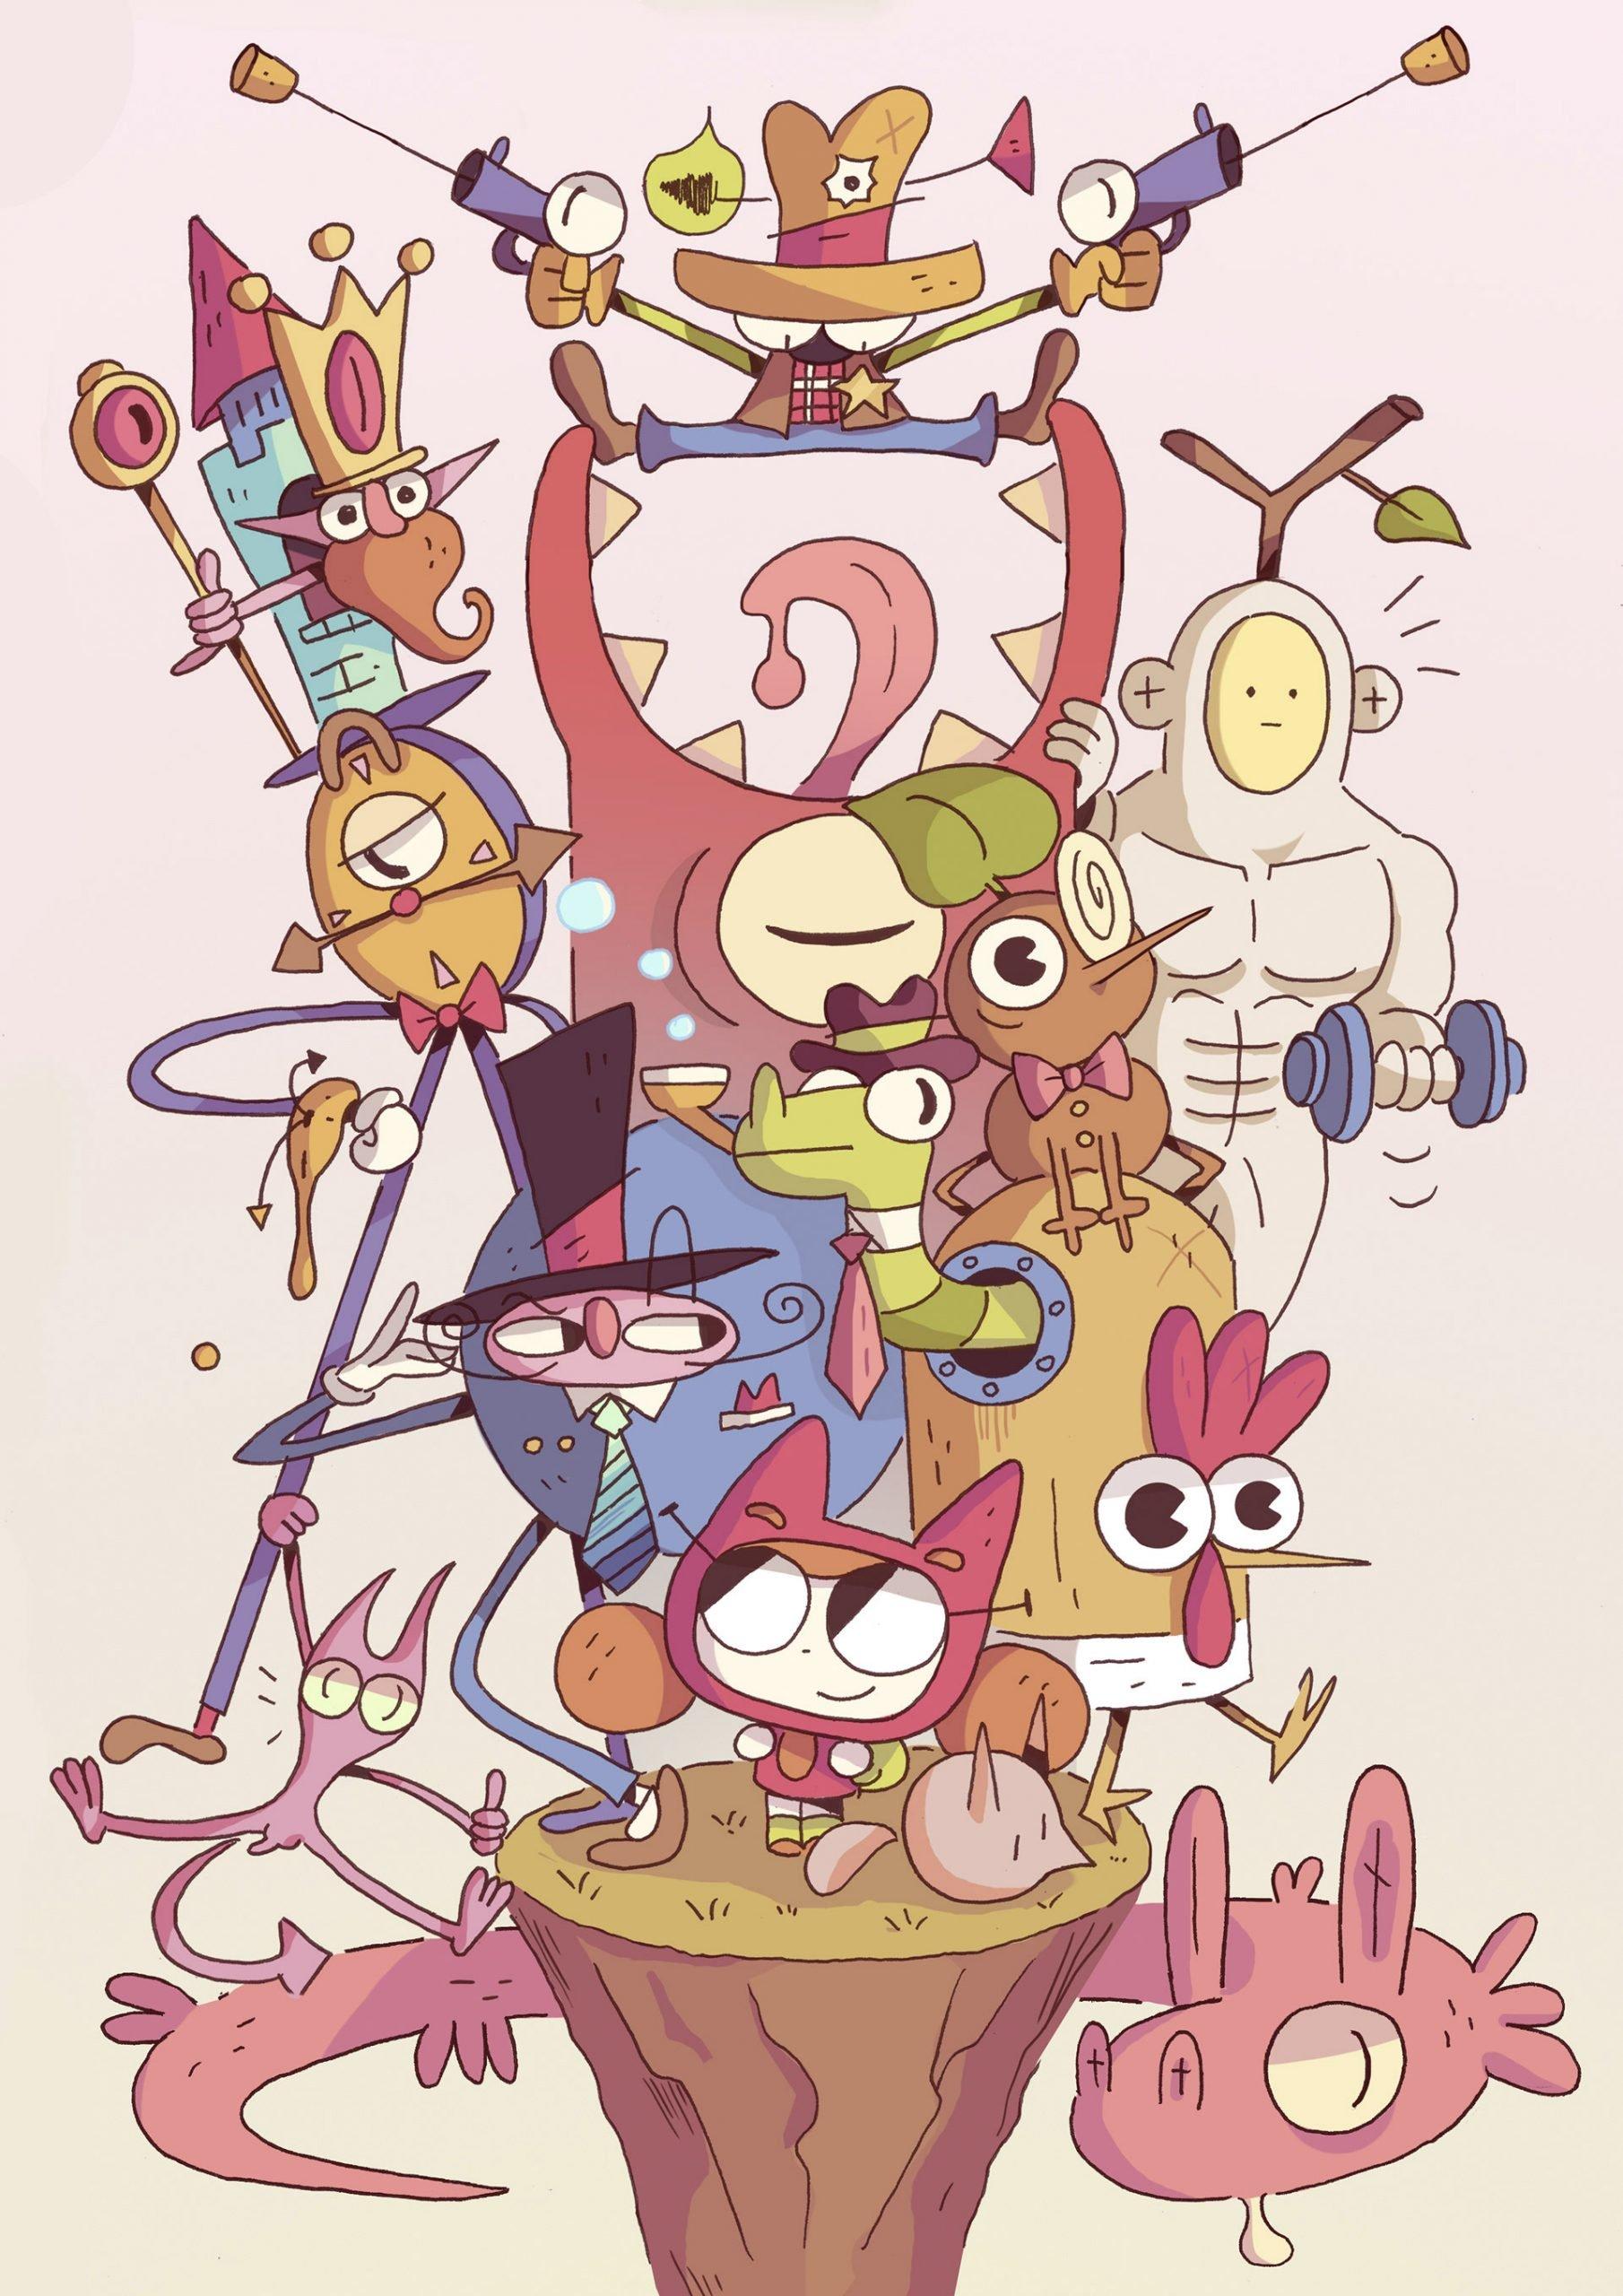 Herbert Ando可爱又古怪的角色插图设计